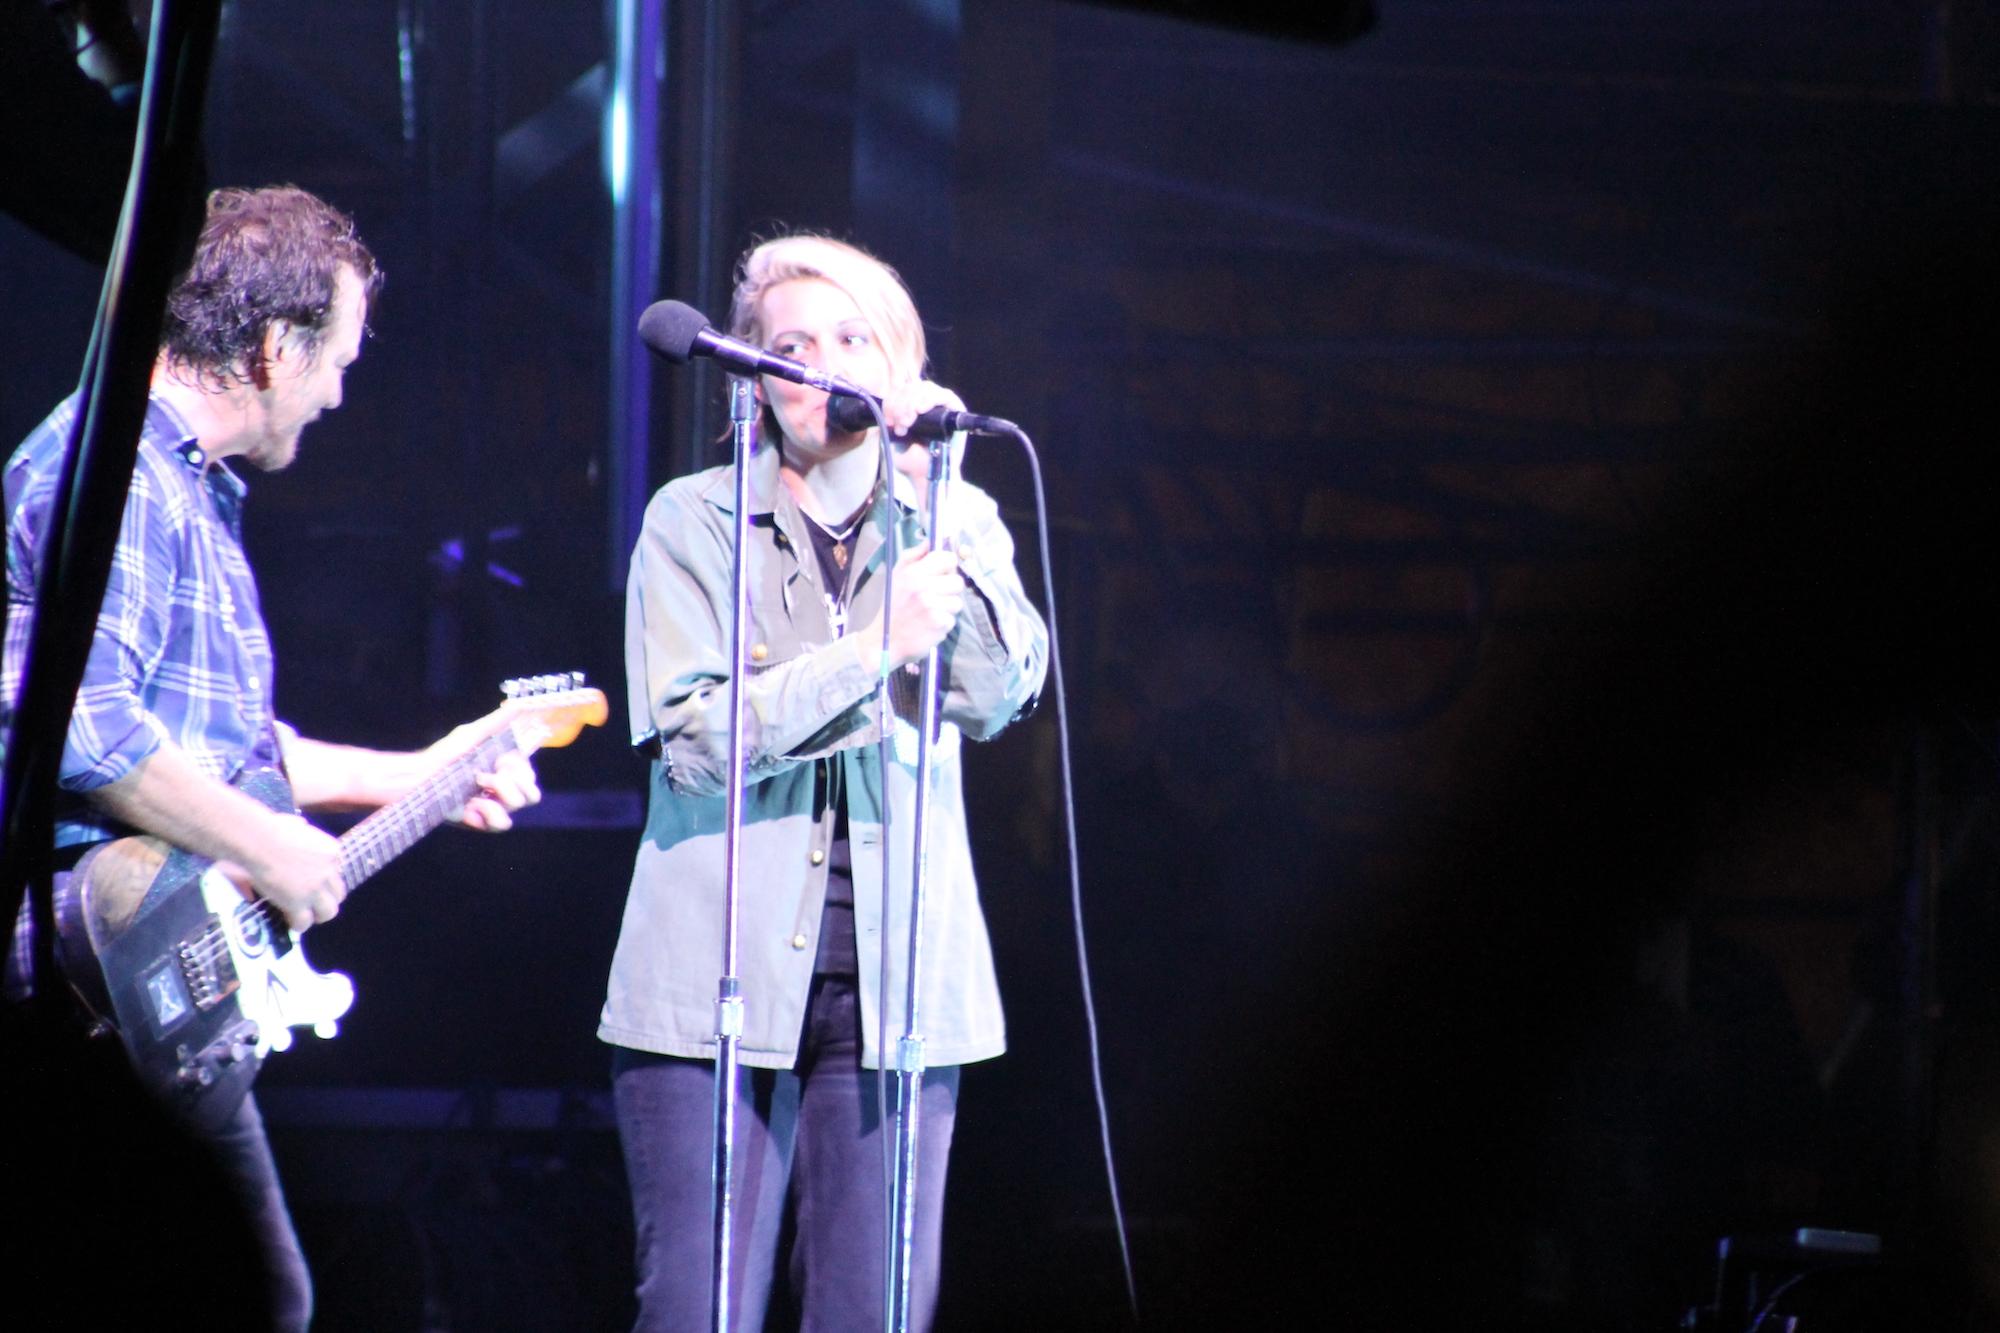 Watch Brandi Carlile Perform 'Better Man' With Pearl Jam